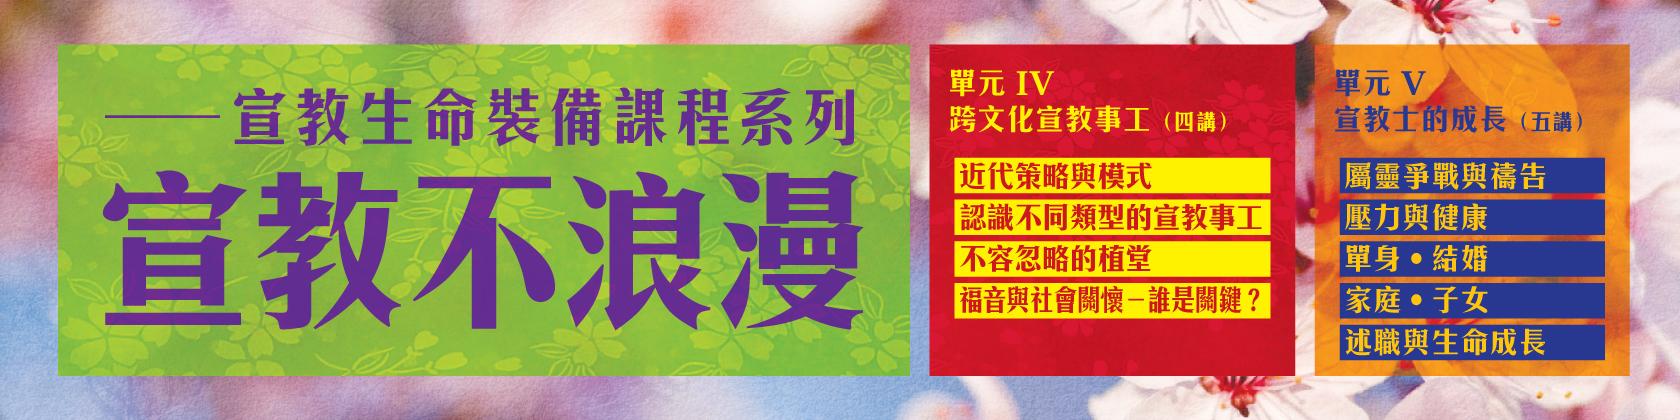 CB-02-web-banner-1680-x-420-v2-02